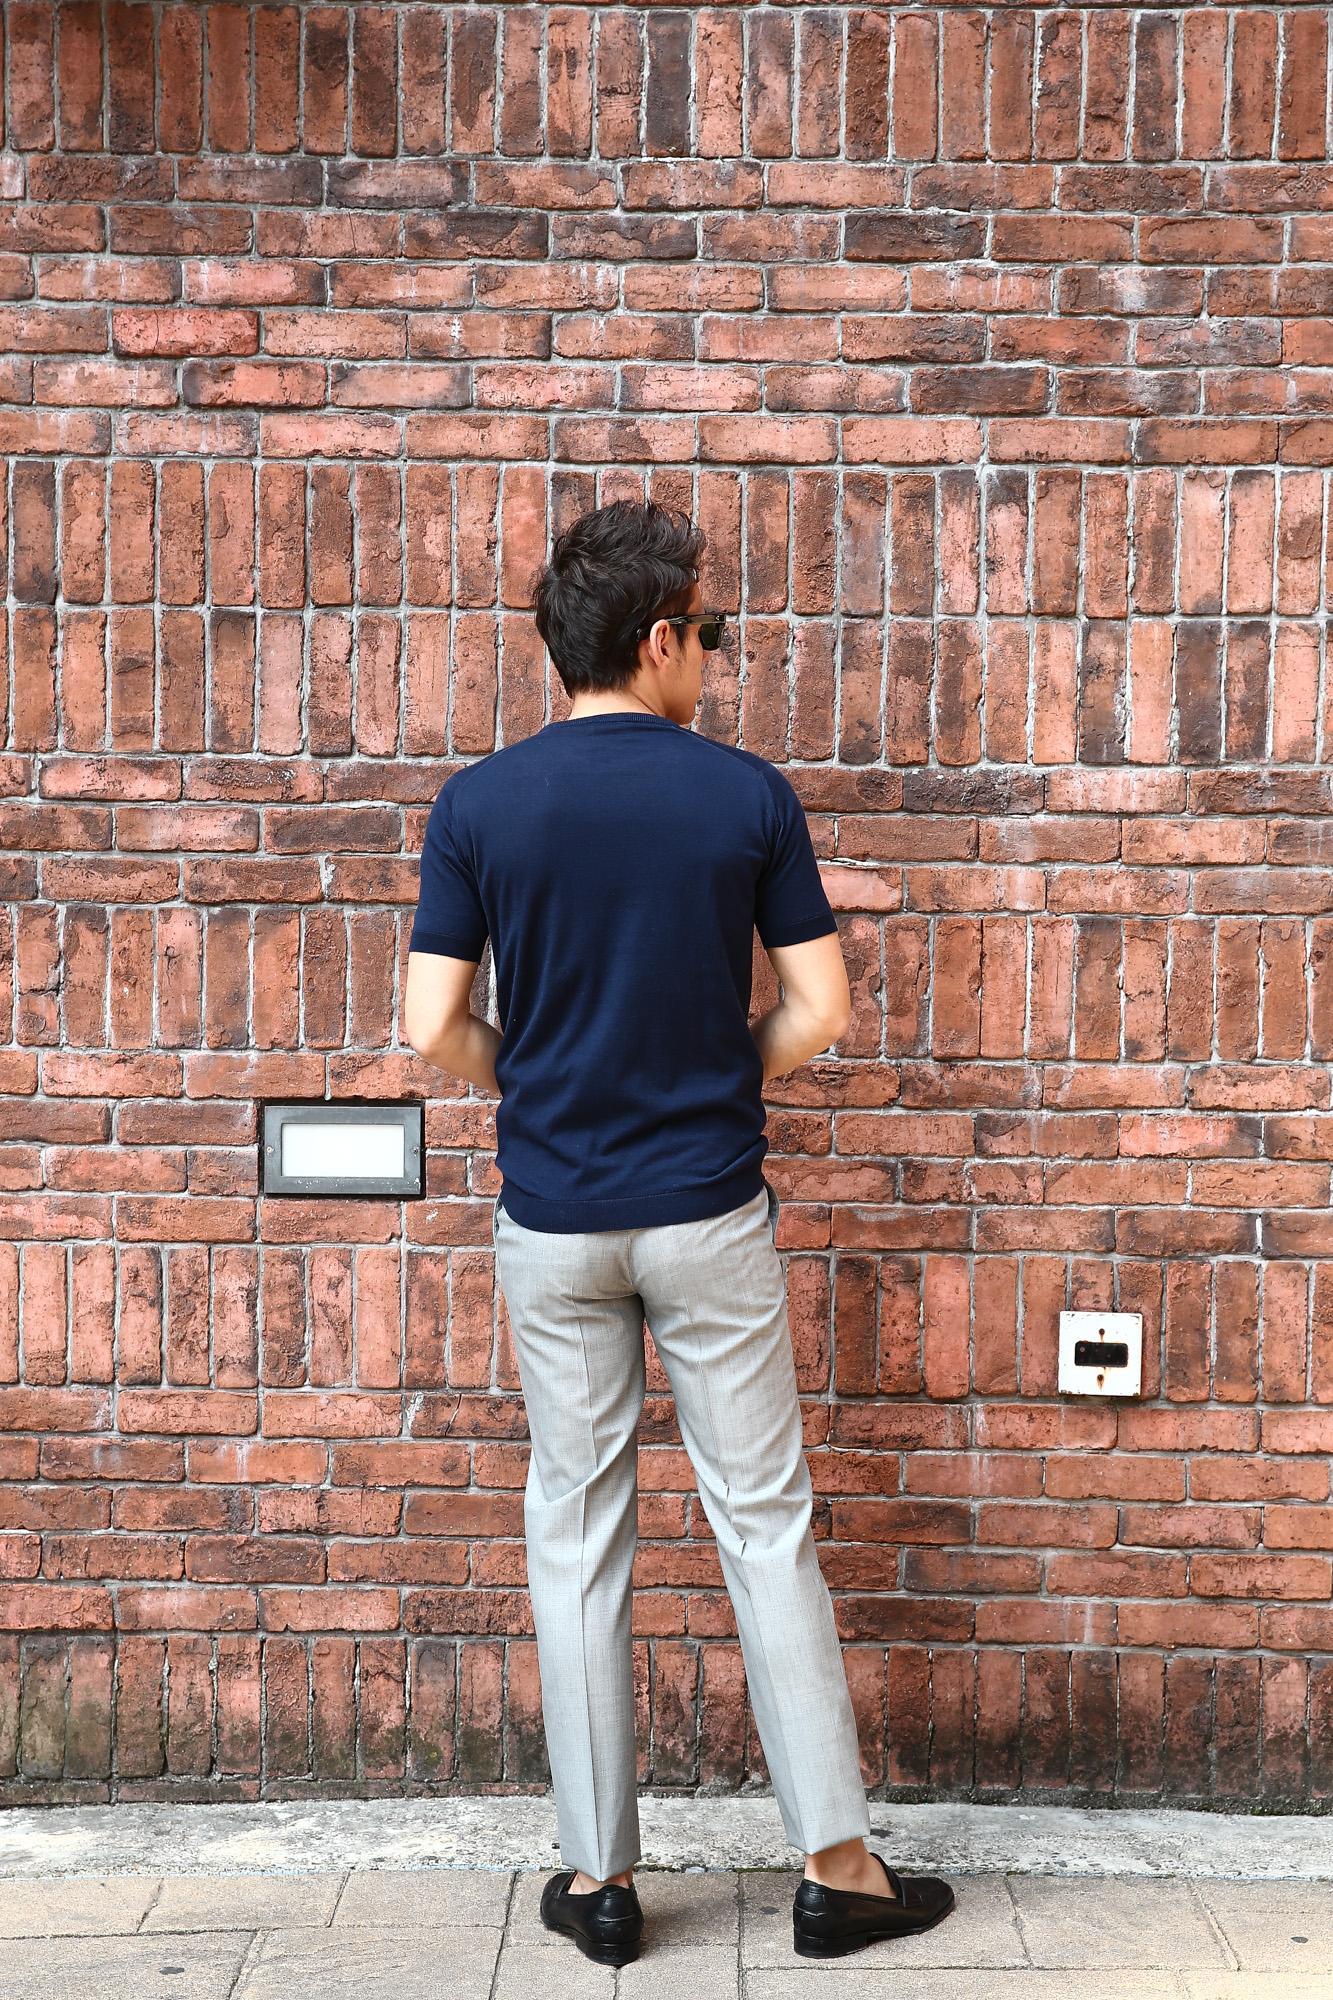 JOHN SMEDLEY (ジョンスメドレー) IMPERIAL KASHMIR (カシミアシリーズ) STONWELL (ストンウェル) CASHMERE × SEA ISLAND COTTON (カシミア × シーアイランドコットン) ショートスリーブ コットンカシミヤニット Tシャツ NAVY (ネイビー) Made in England (イギリス製) 2018 春夏新作 johnsmedley カシミア カシミヤ 愛知 名古屋 ZODIAC ゾディアック